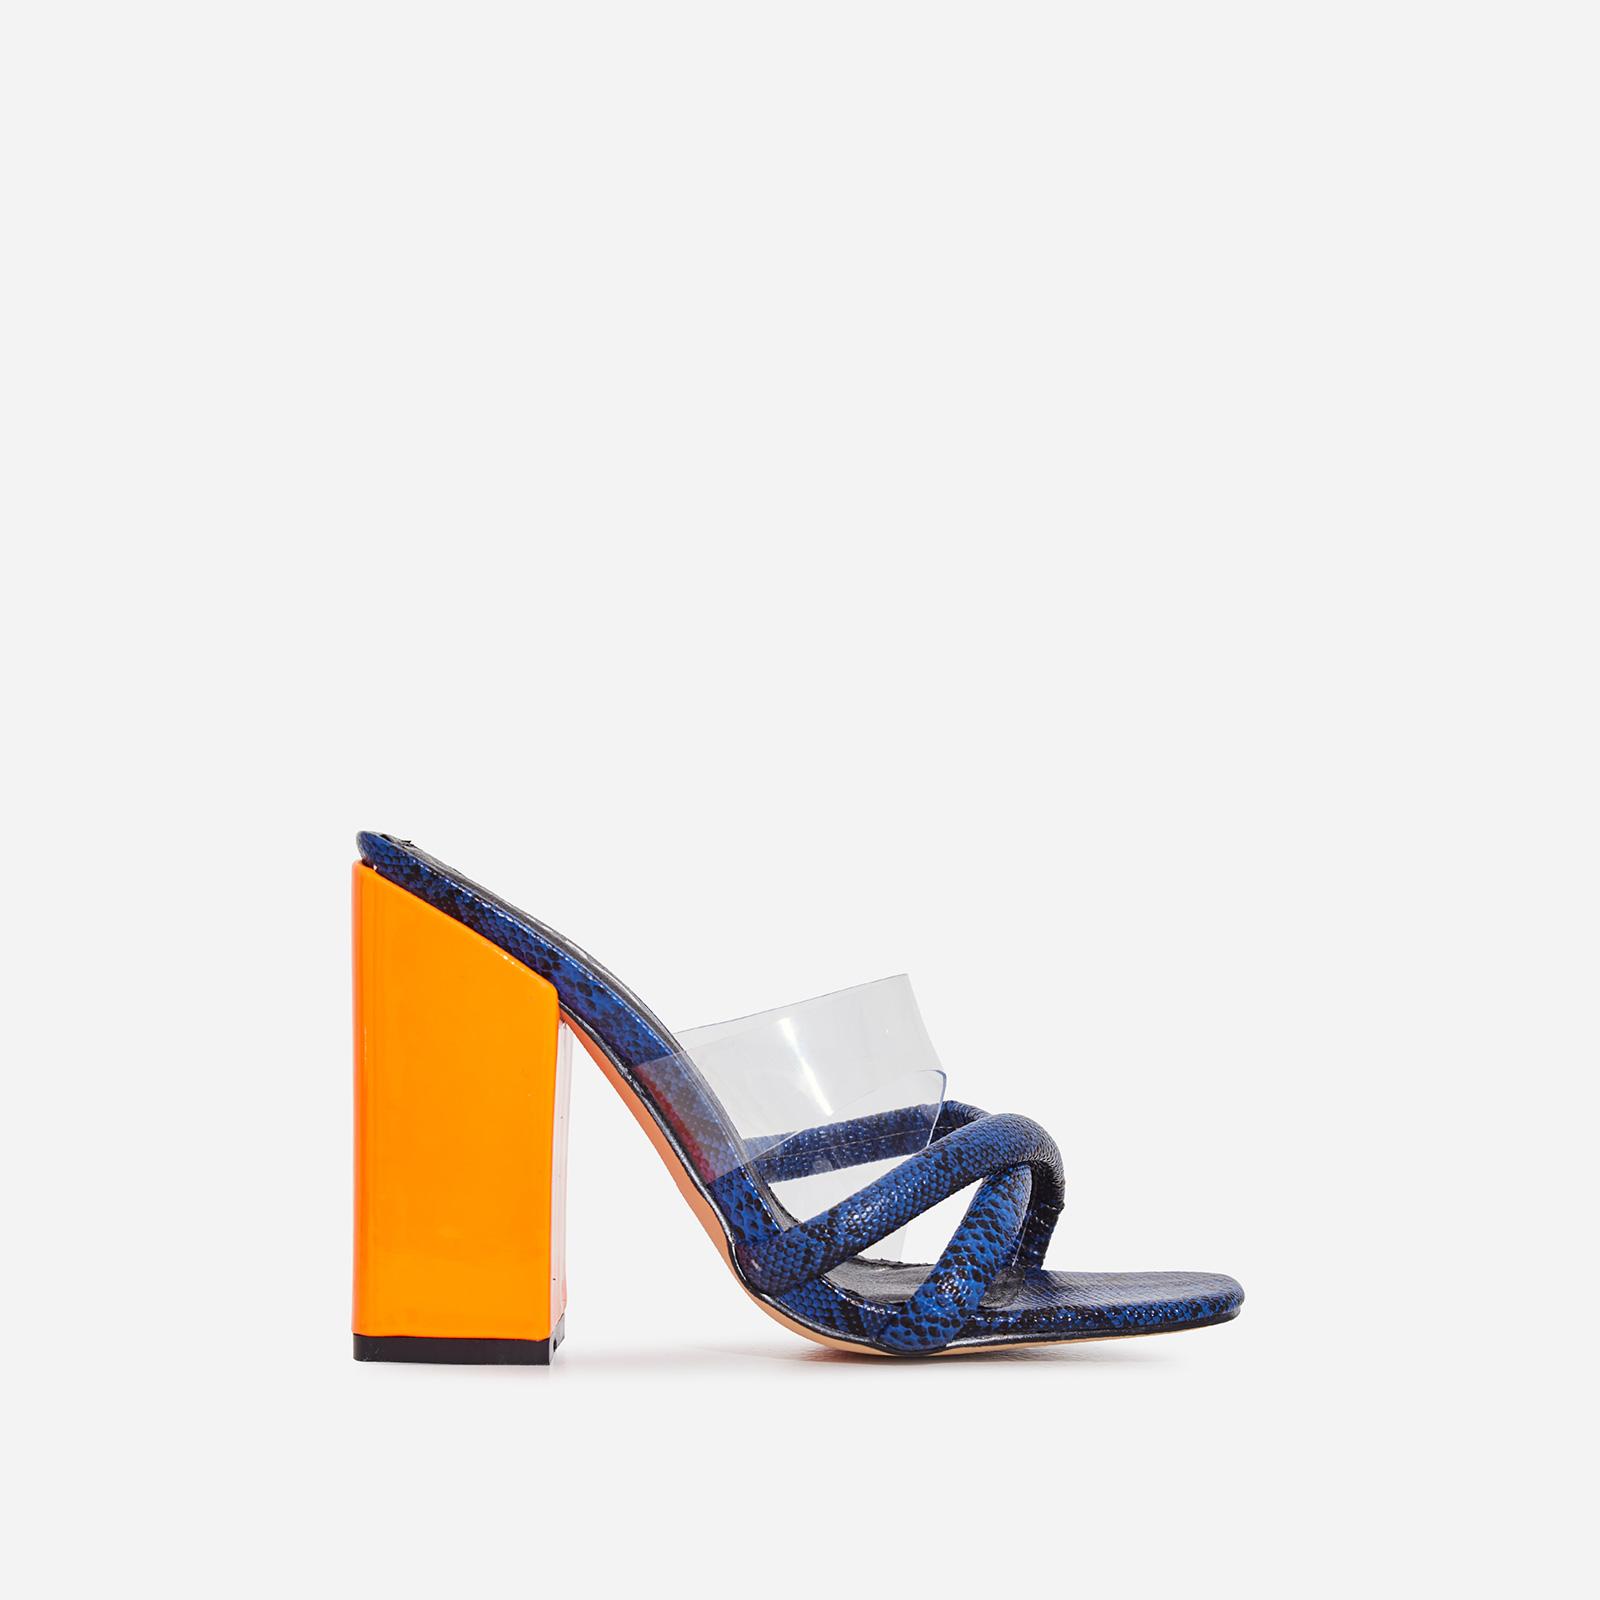 Lumi Square Toe Perspex Block Heel Mule In Blue Snake Print Faux Leather